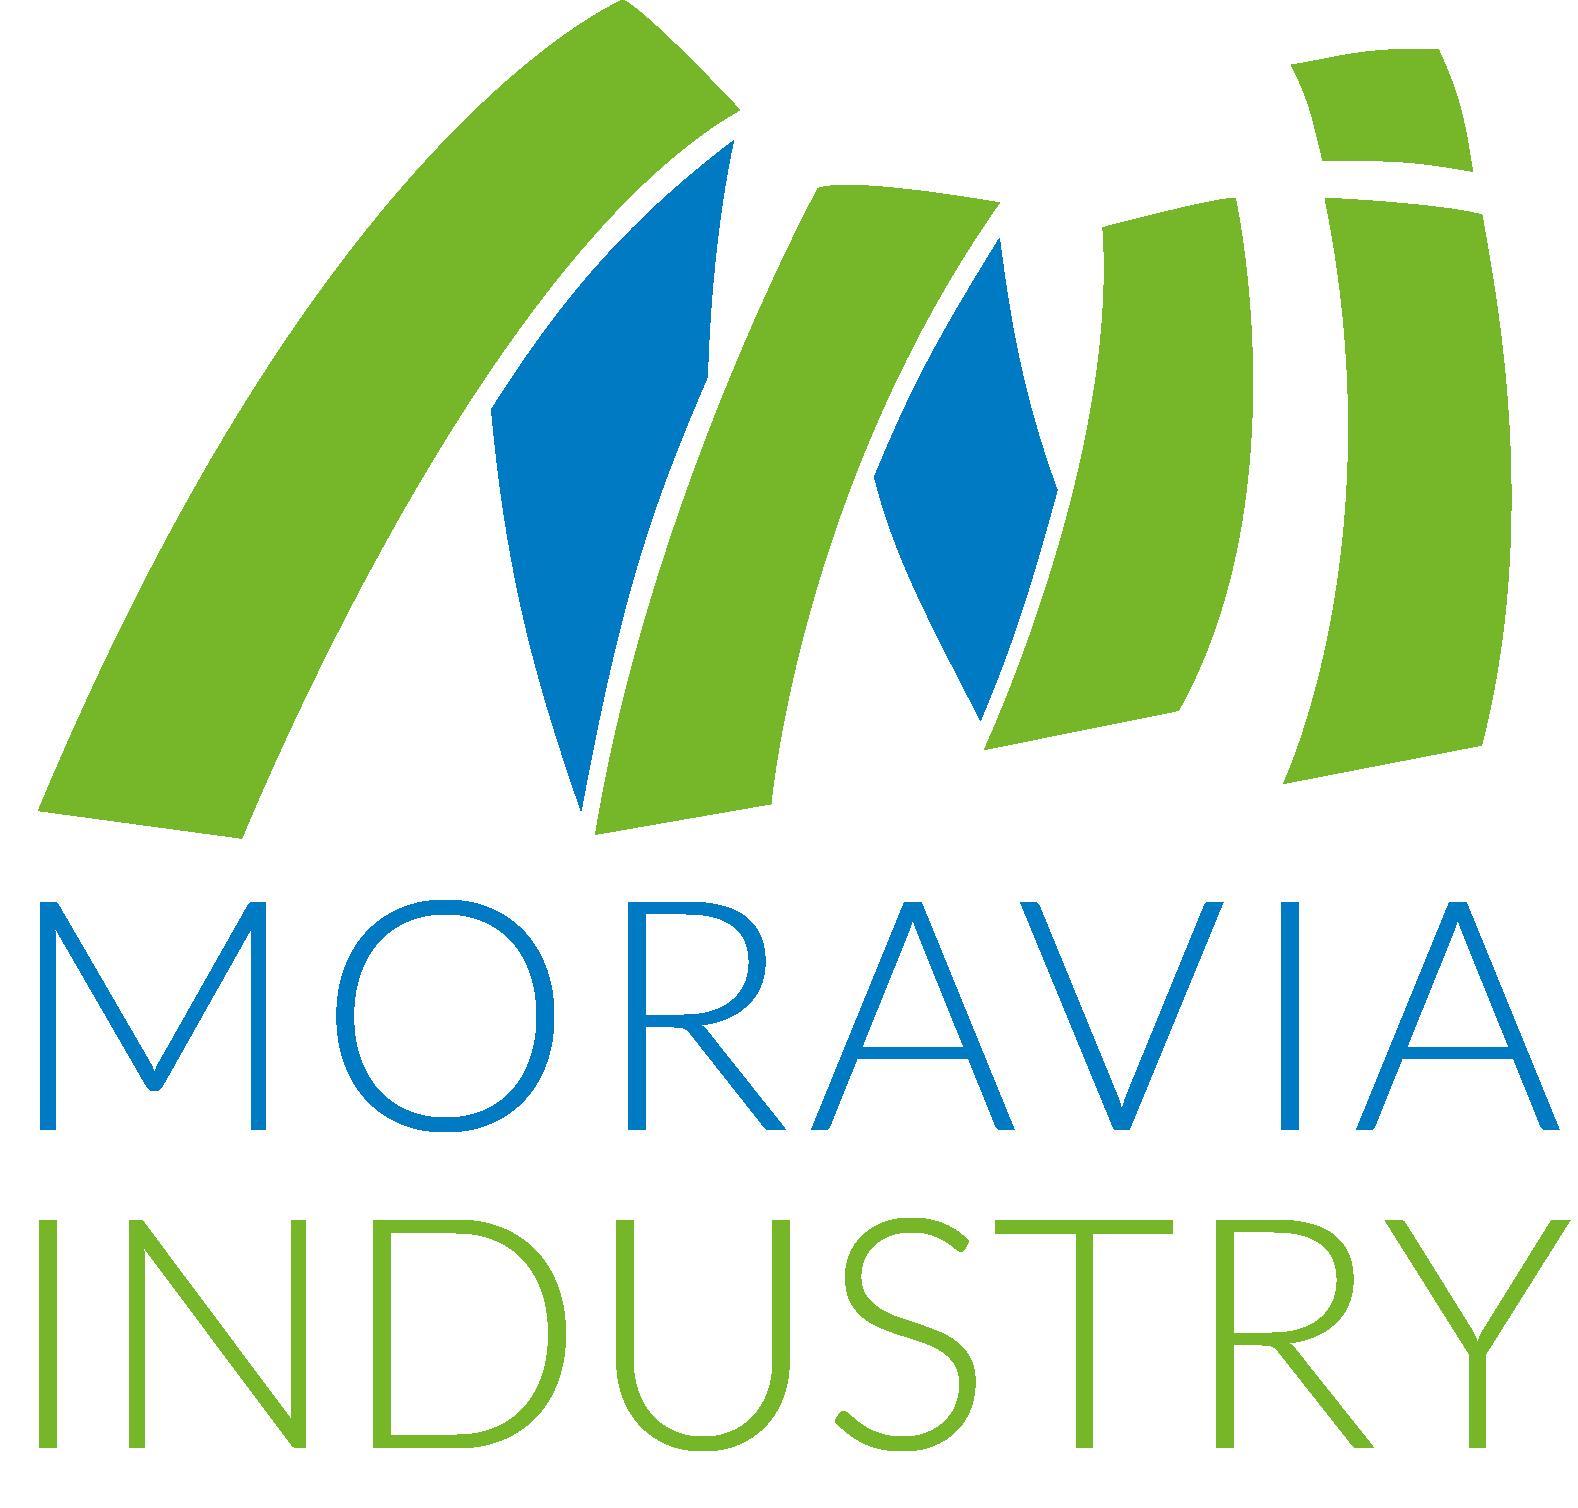 Moravia Industry s.r.o.